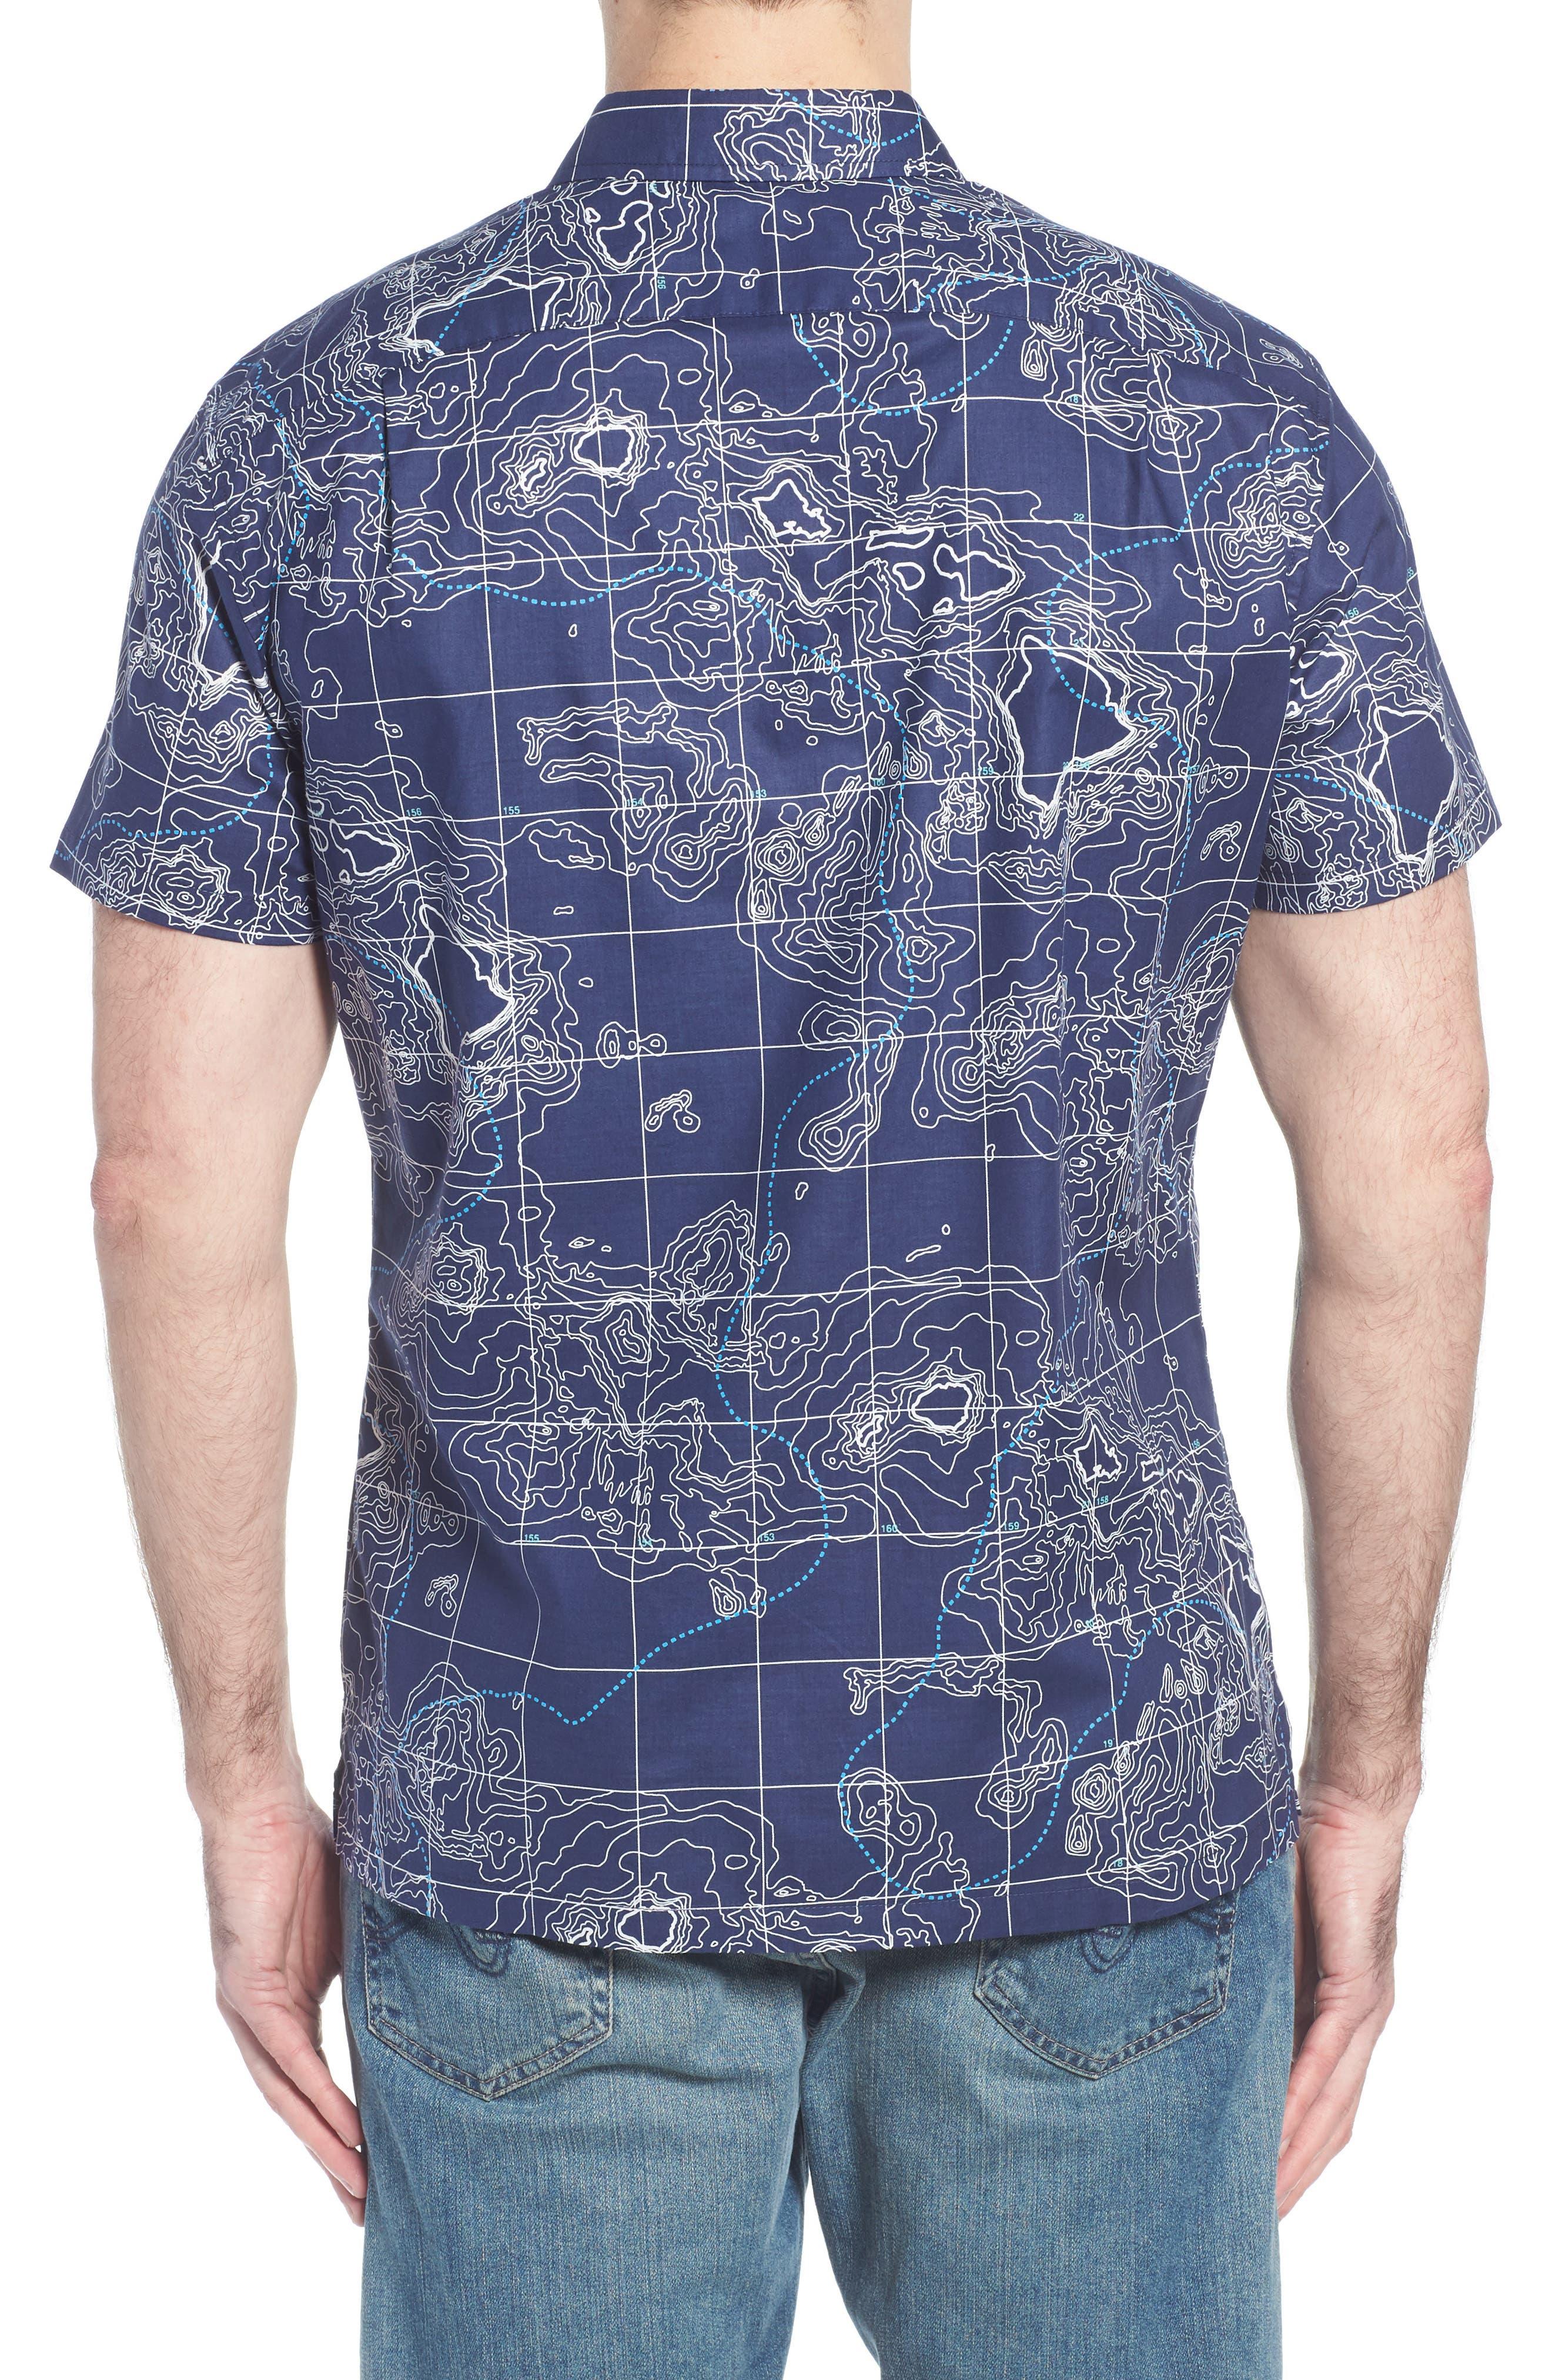 21N 158W Trim Fit Camp Shirt,                             Alternate thumbnail 2, color,                             NAVY